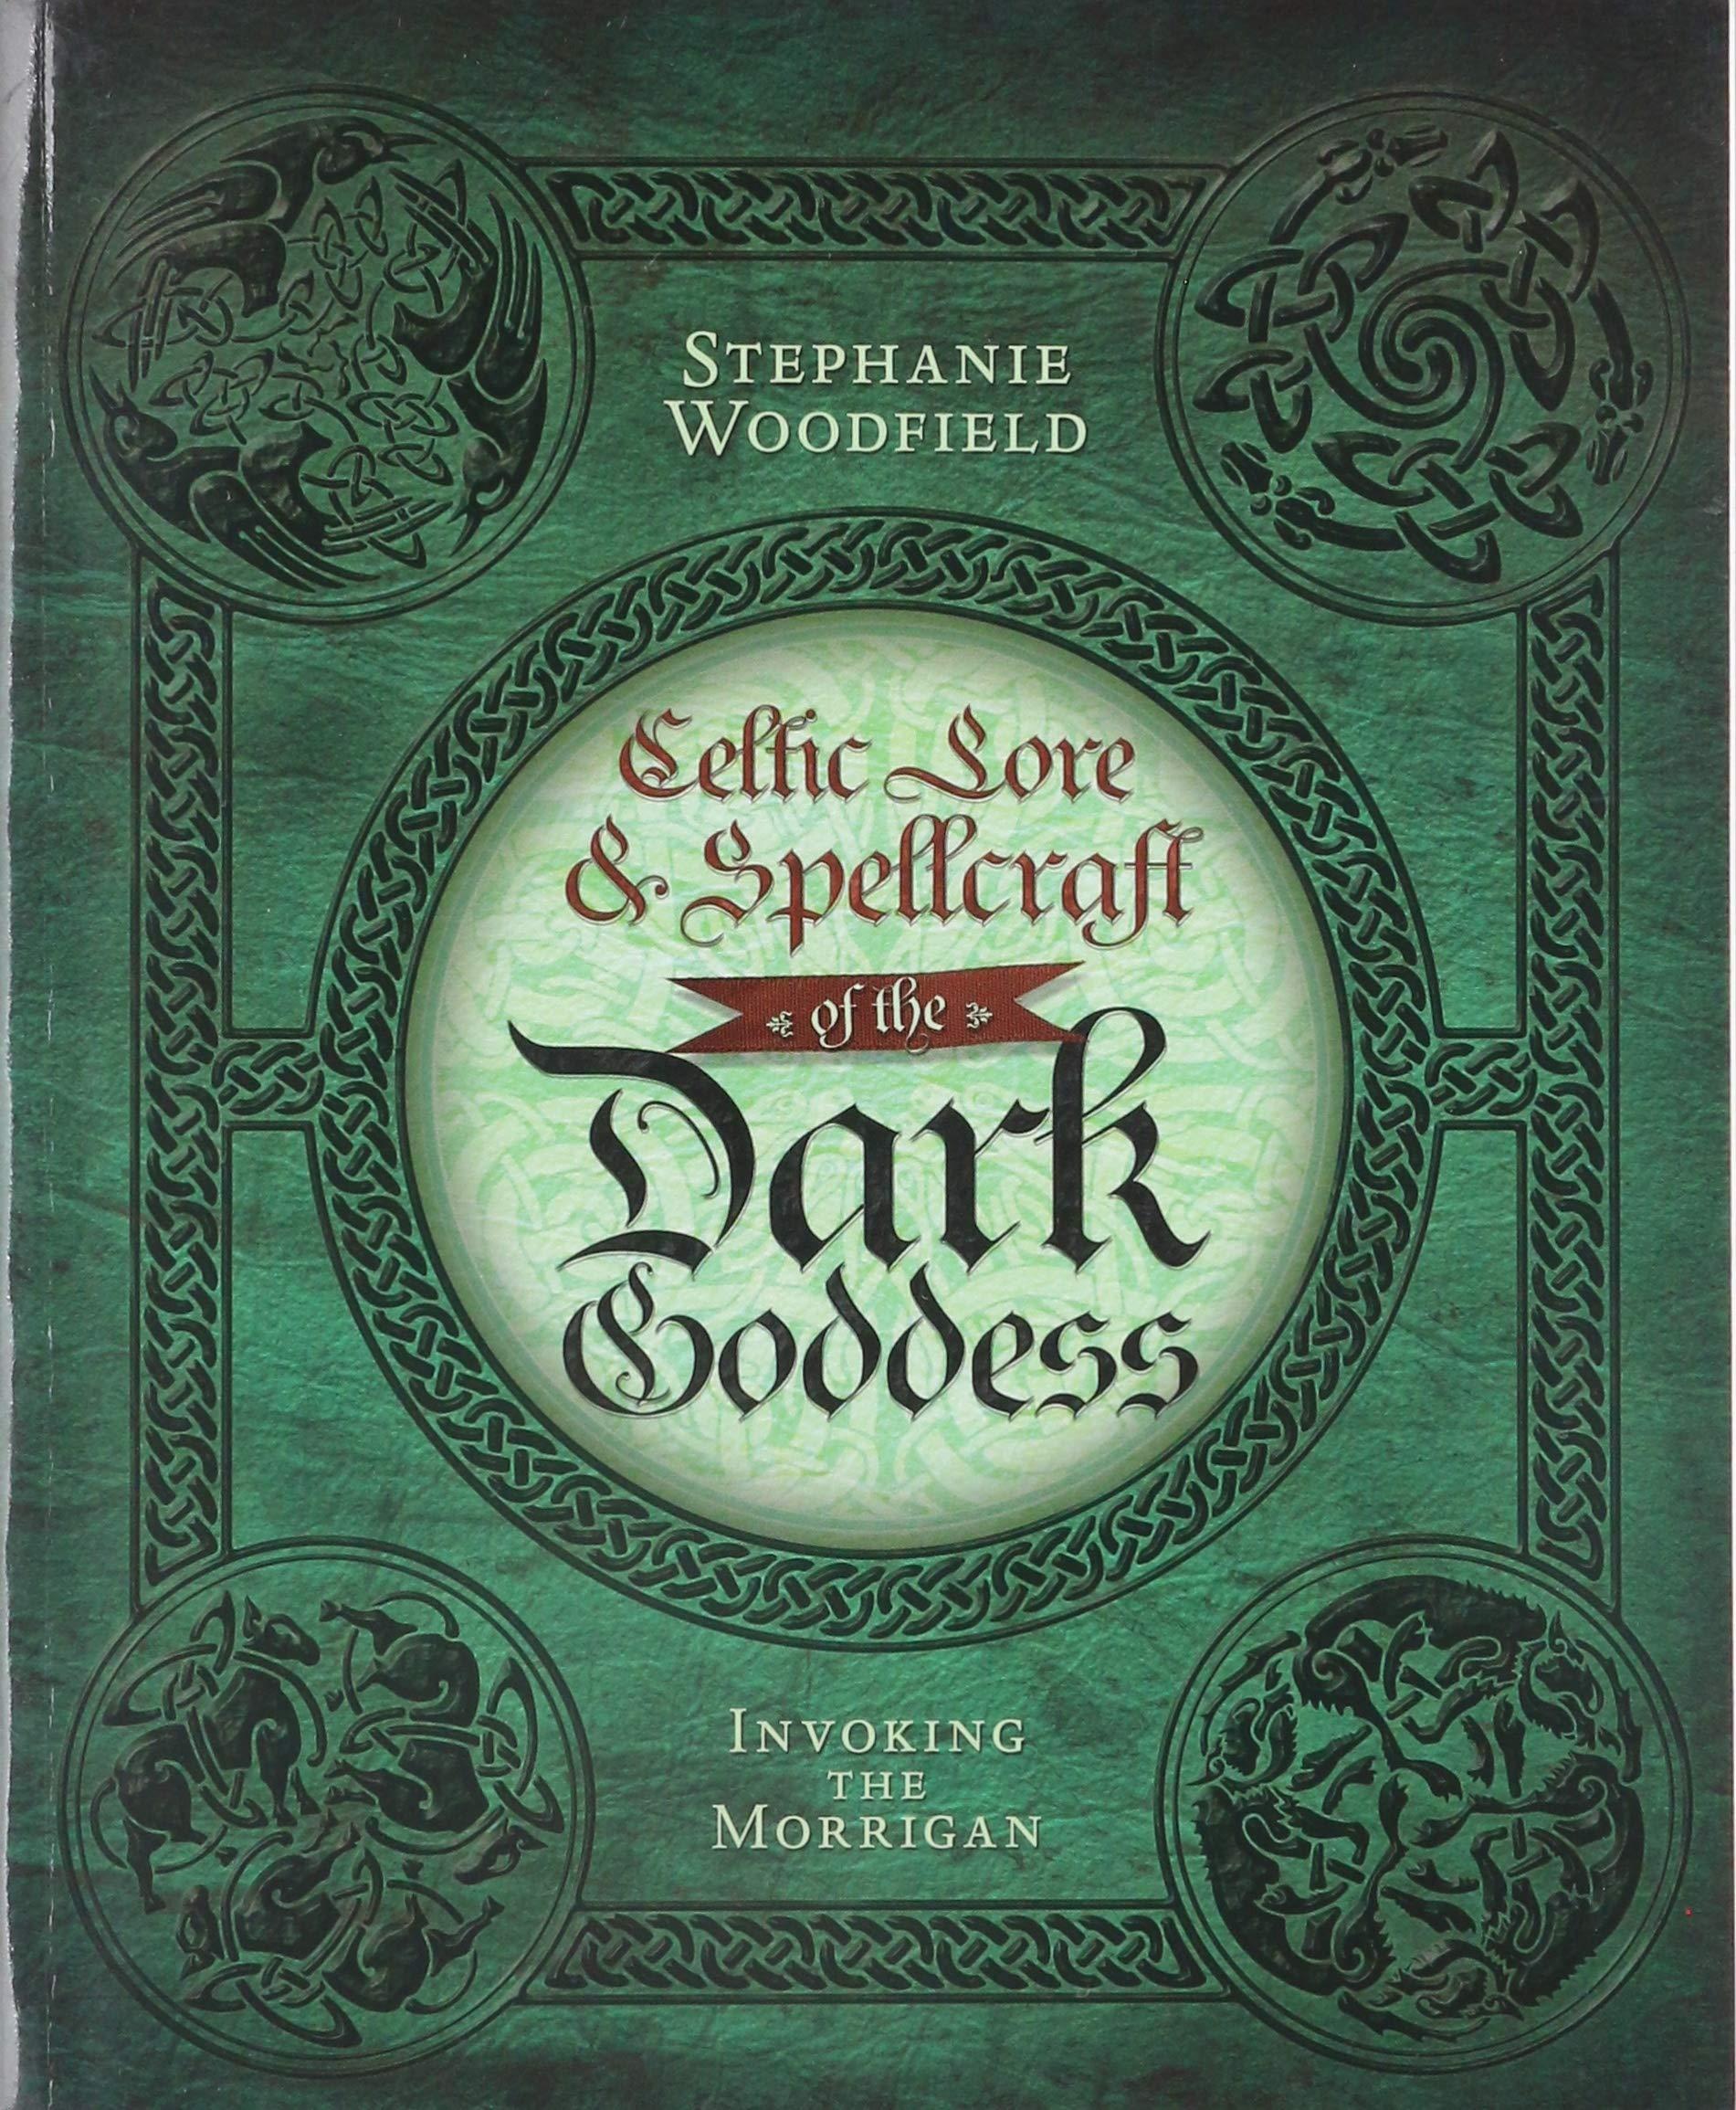 Celtic Lore & Spellcraft of the Dark